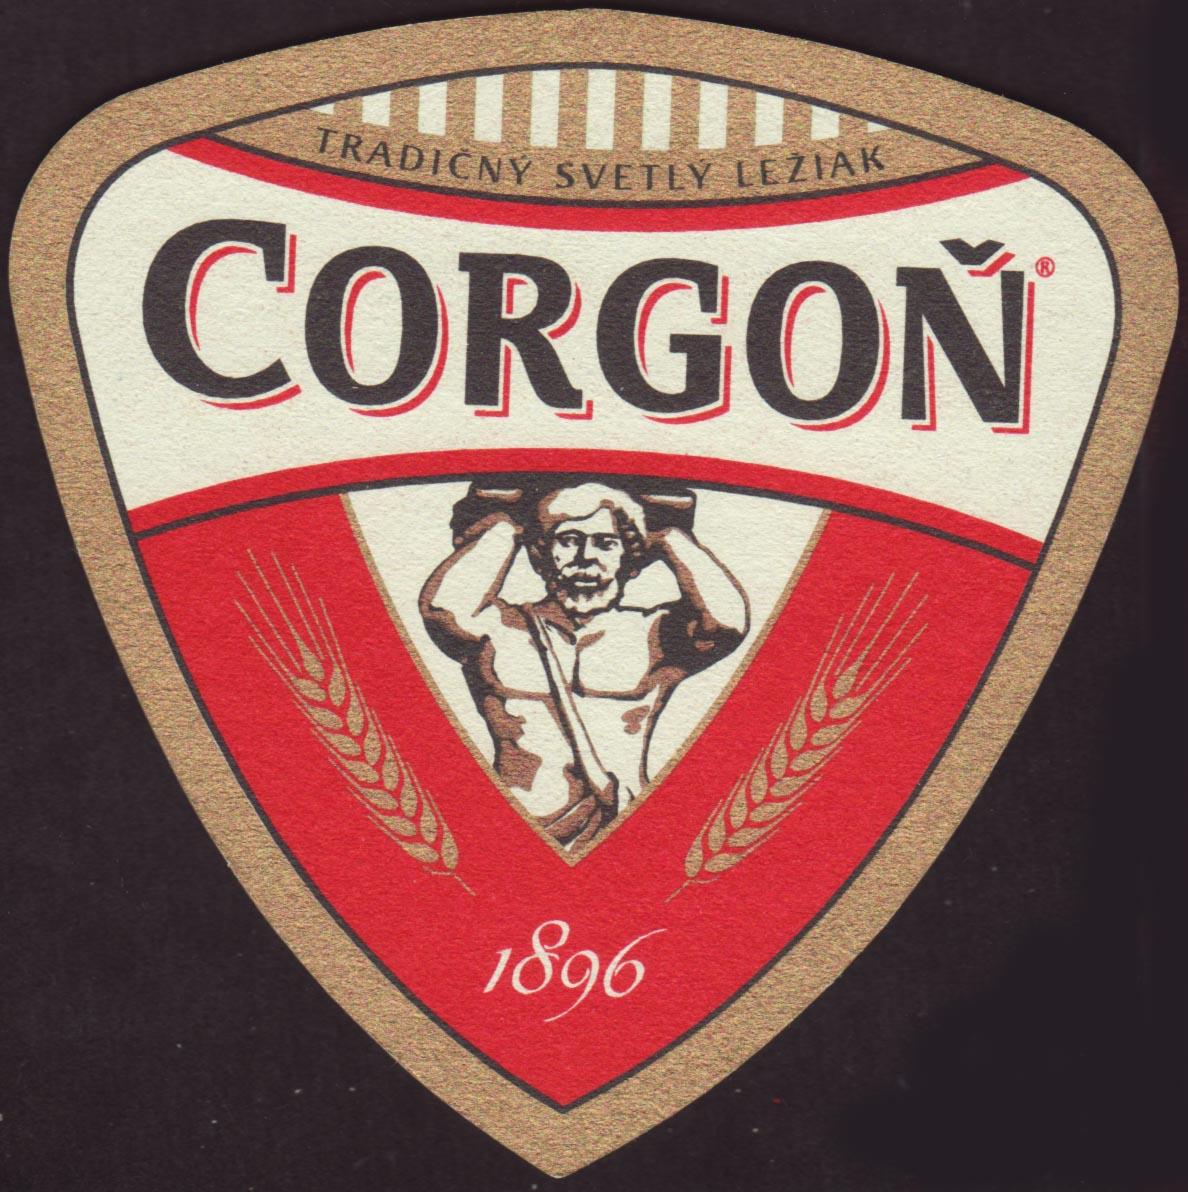 Beer coaster corgon-11